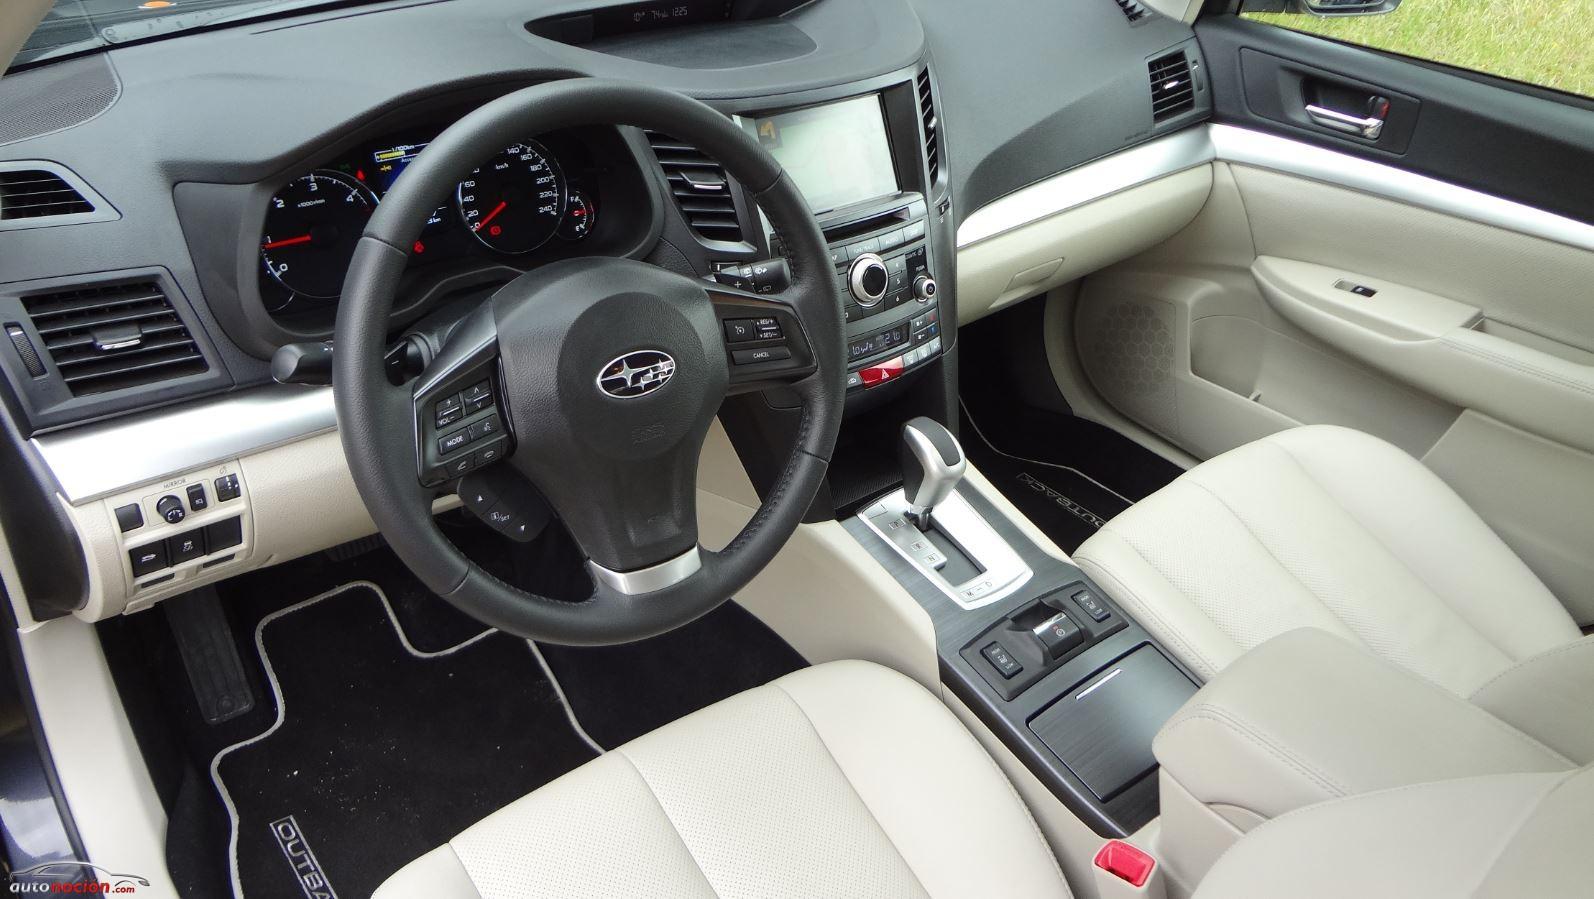 Opini N Y Prueba Subaru Outback 2013 Di Sel Lineartronic Parte 3